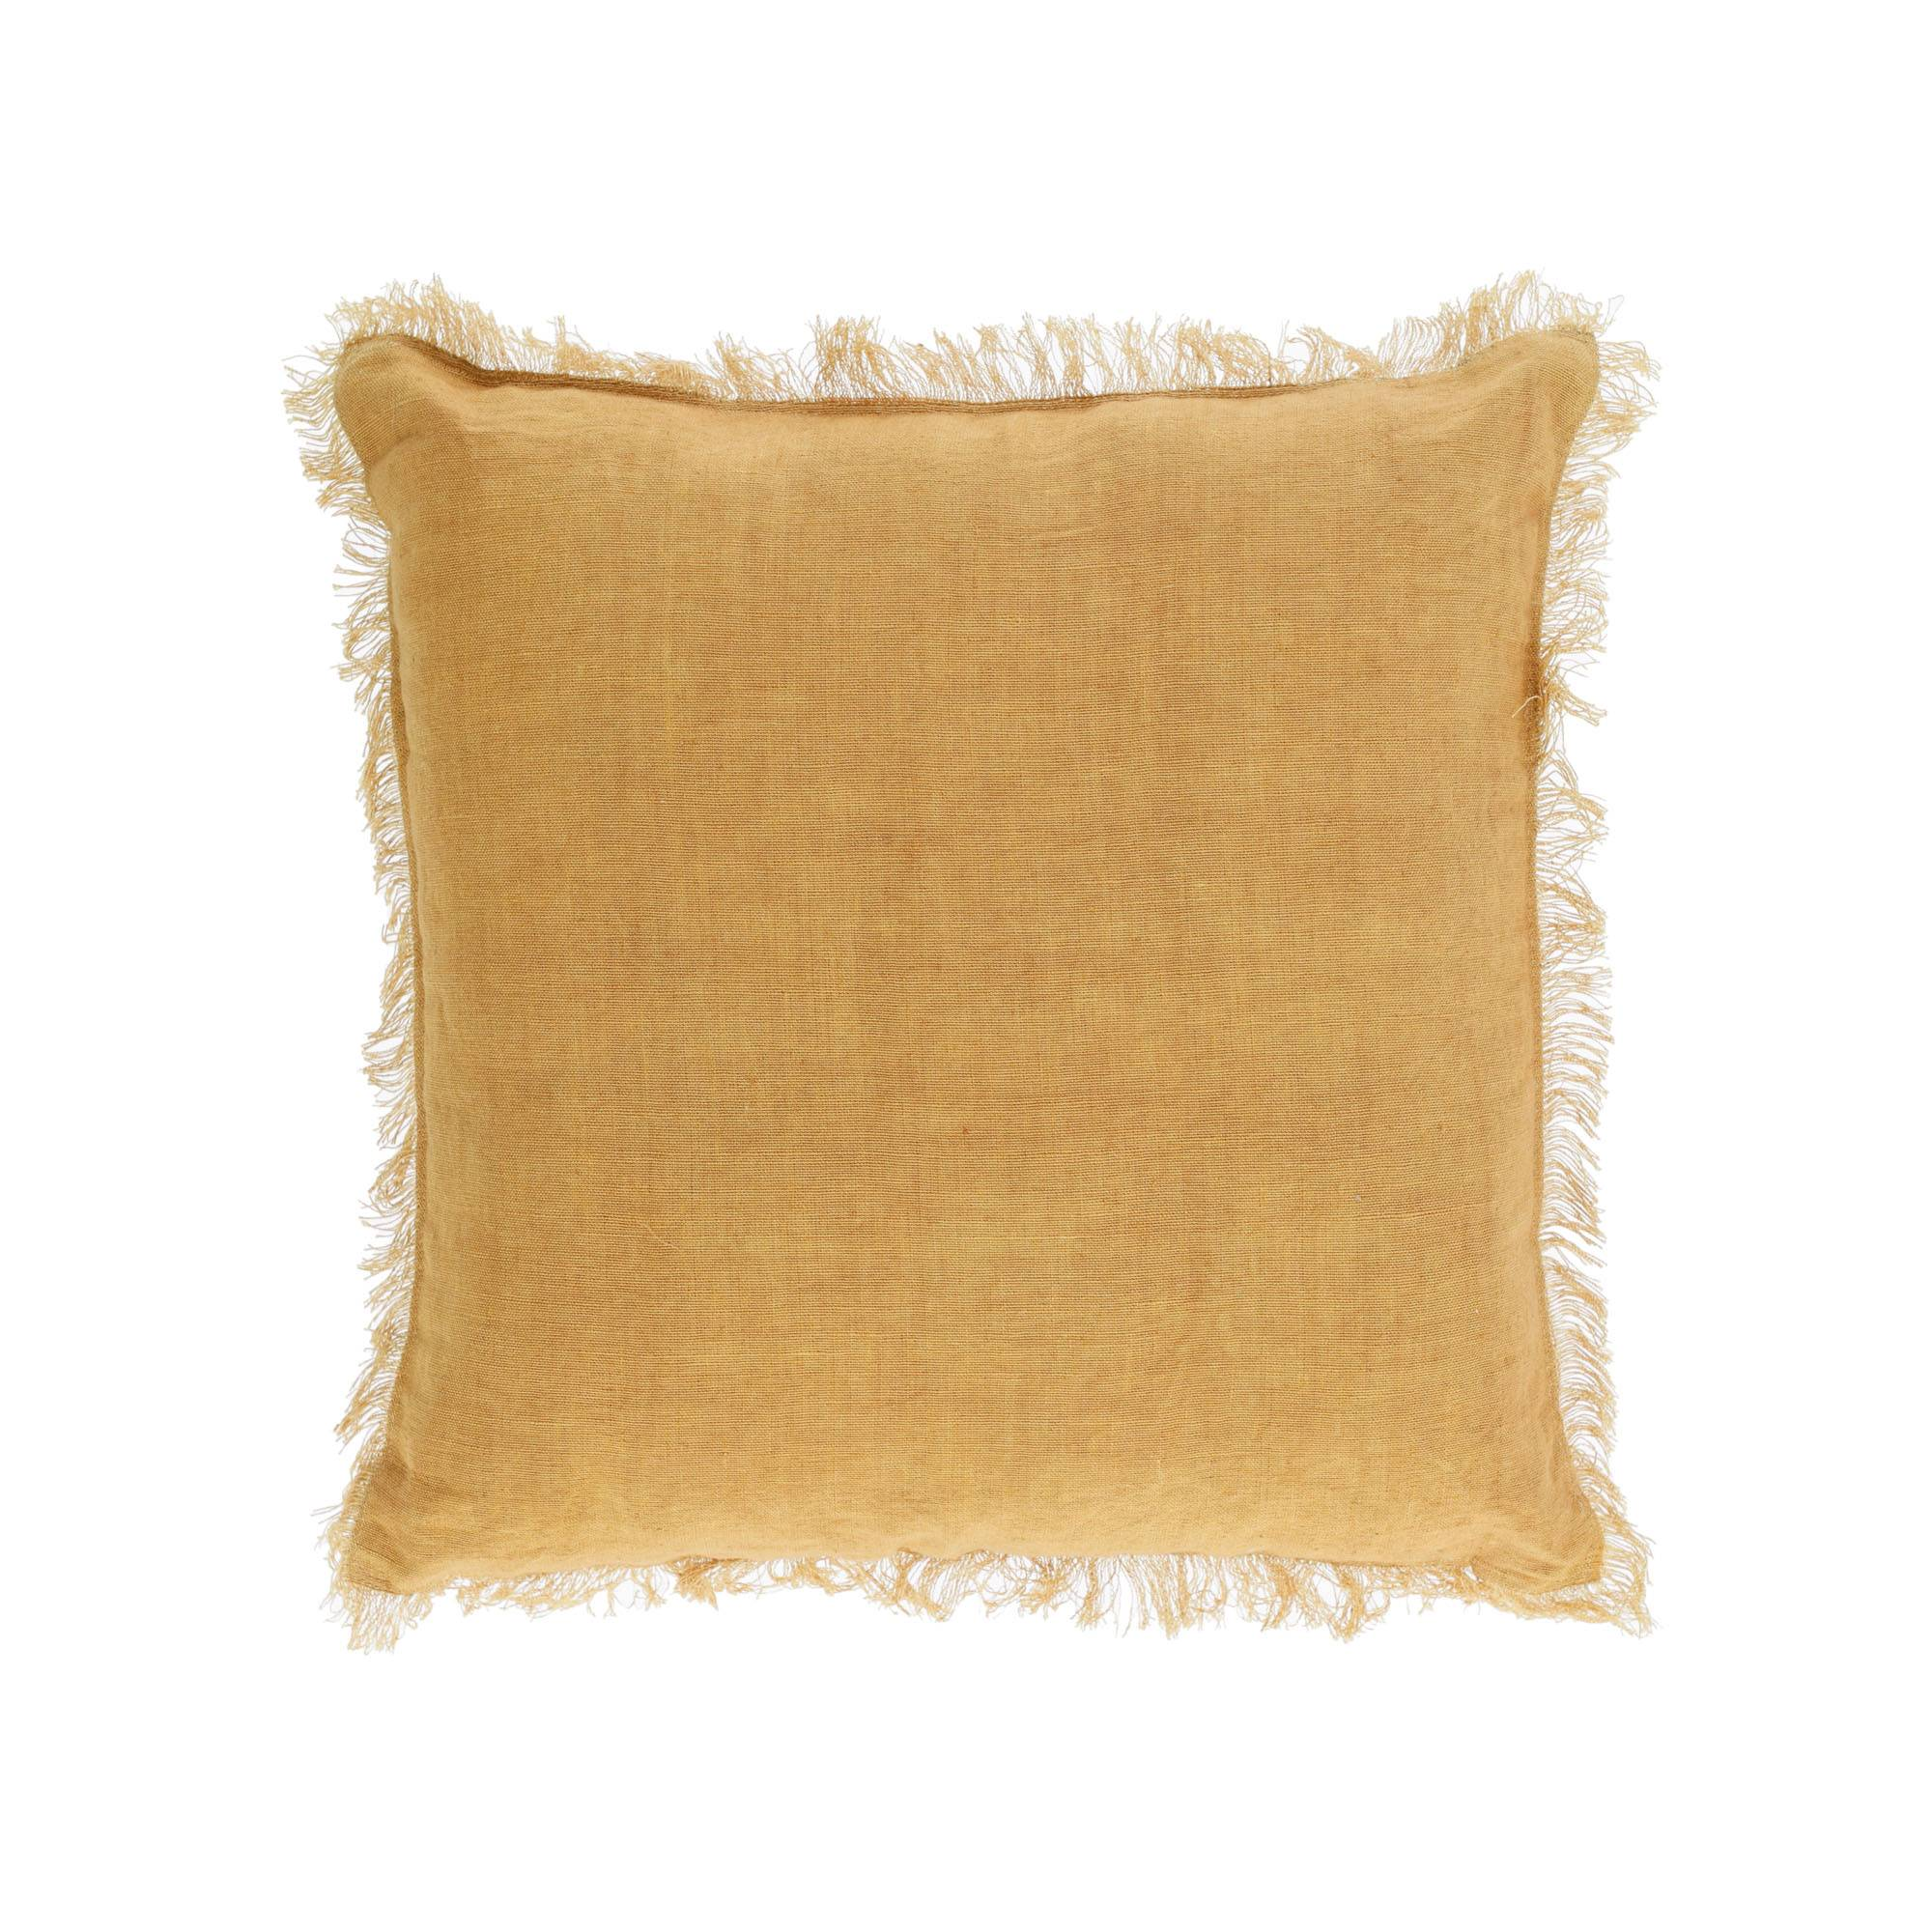 Kave Home Fodera cuscino Almira cotone e lino con frange mostarda 45 x 45 cm